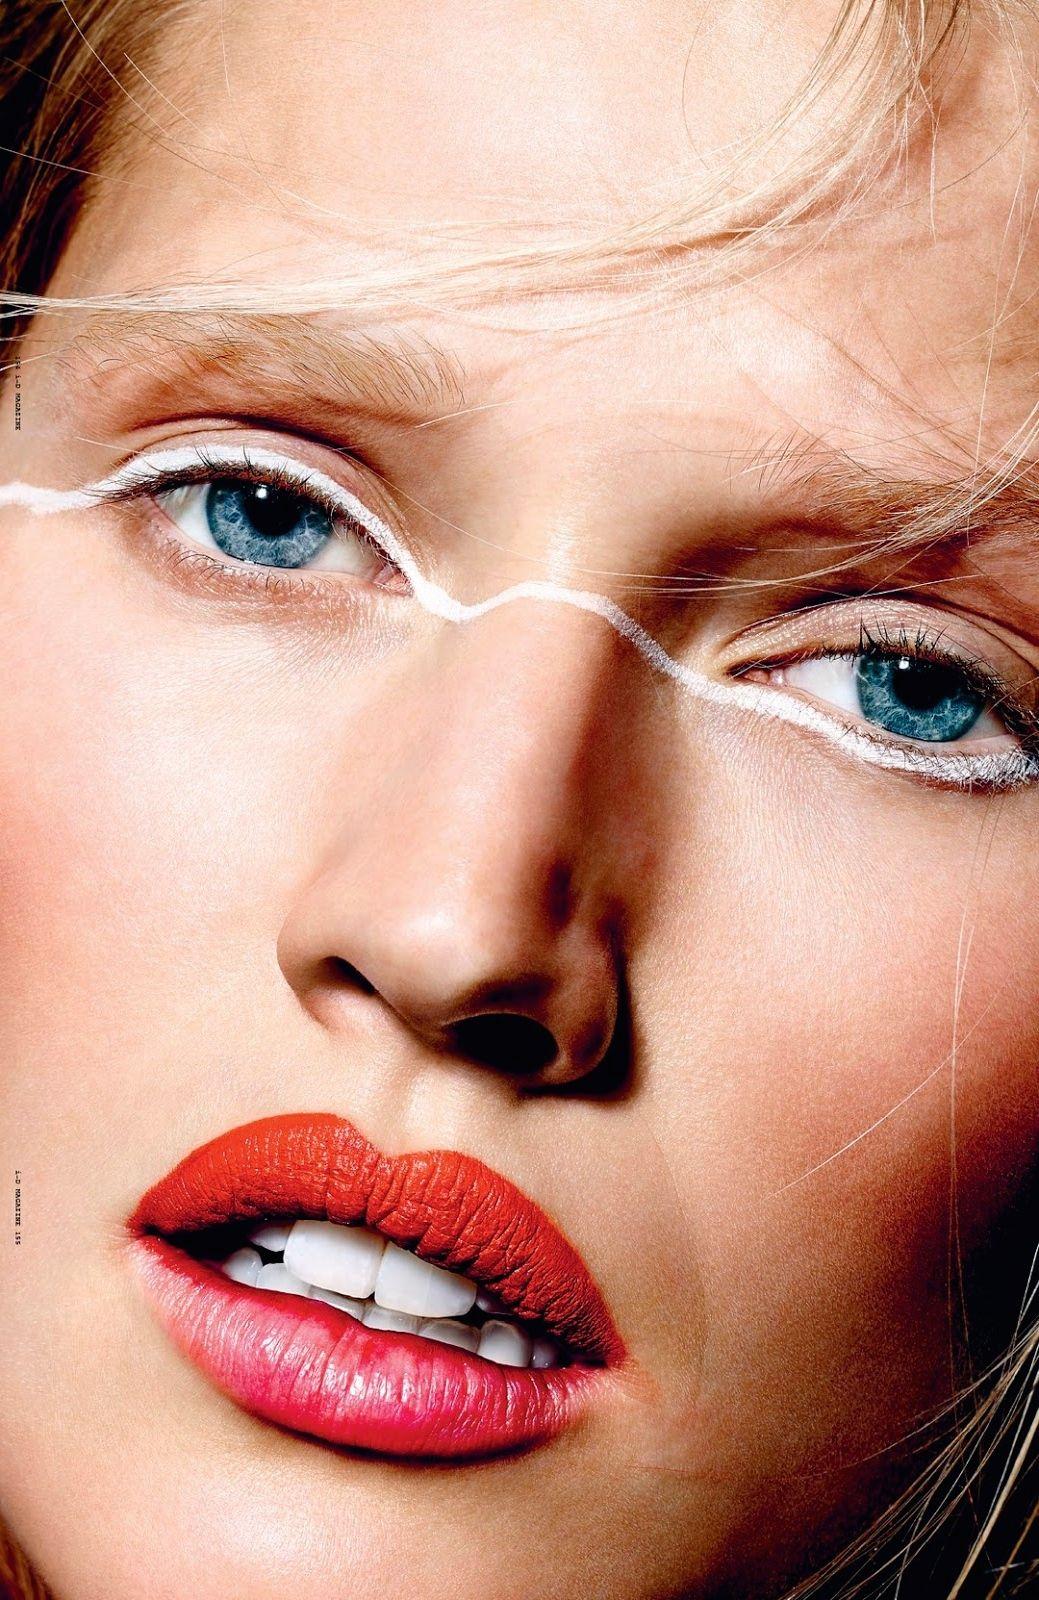 #ToniGarrn by #RichardBurbridge for #iDMagazine Winter 2014